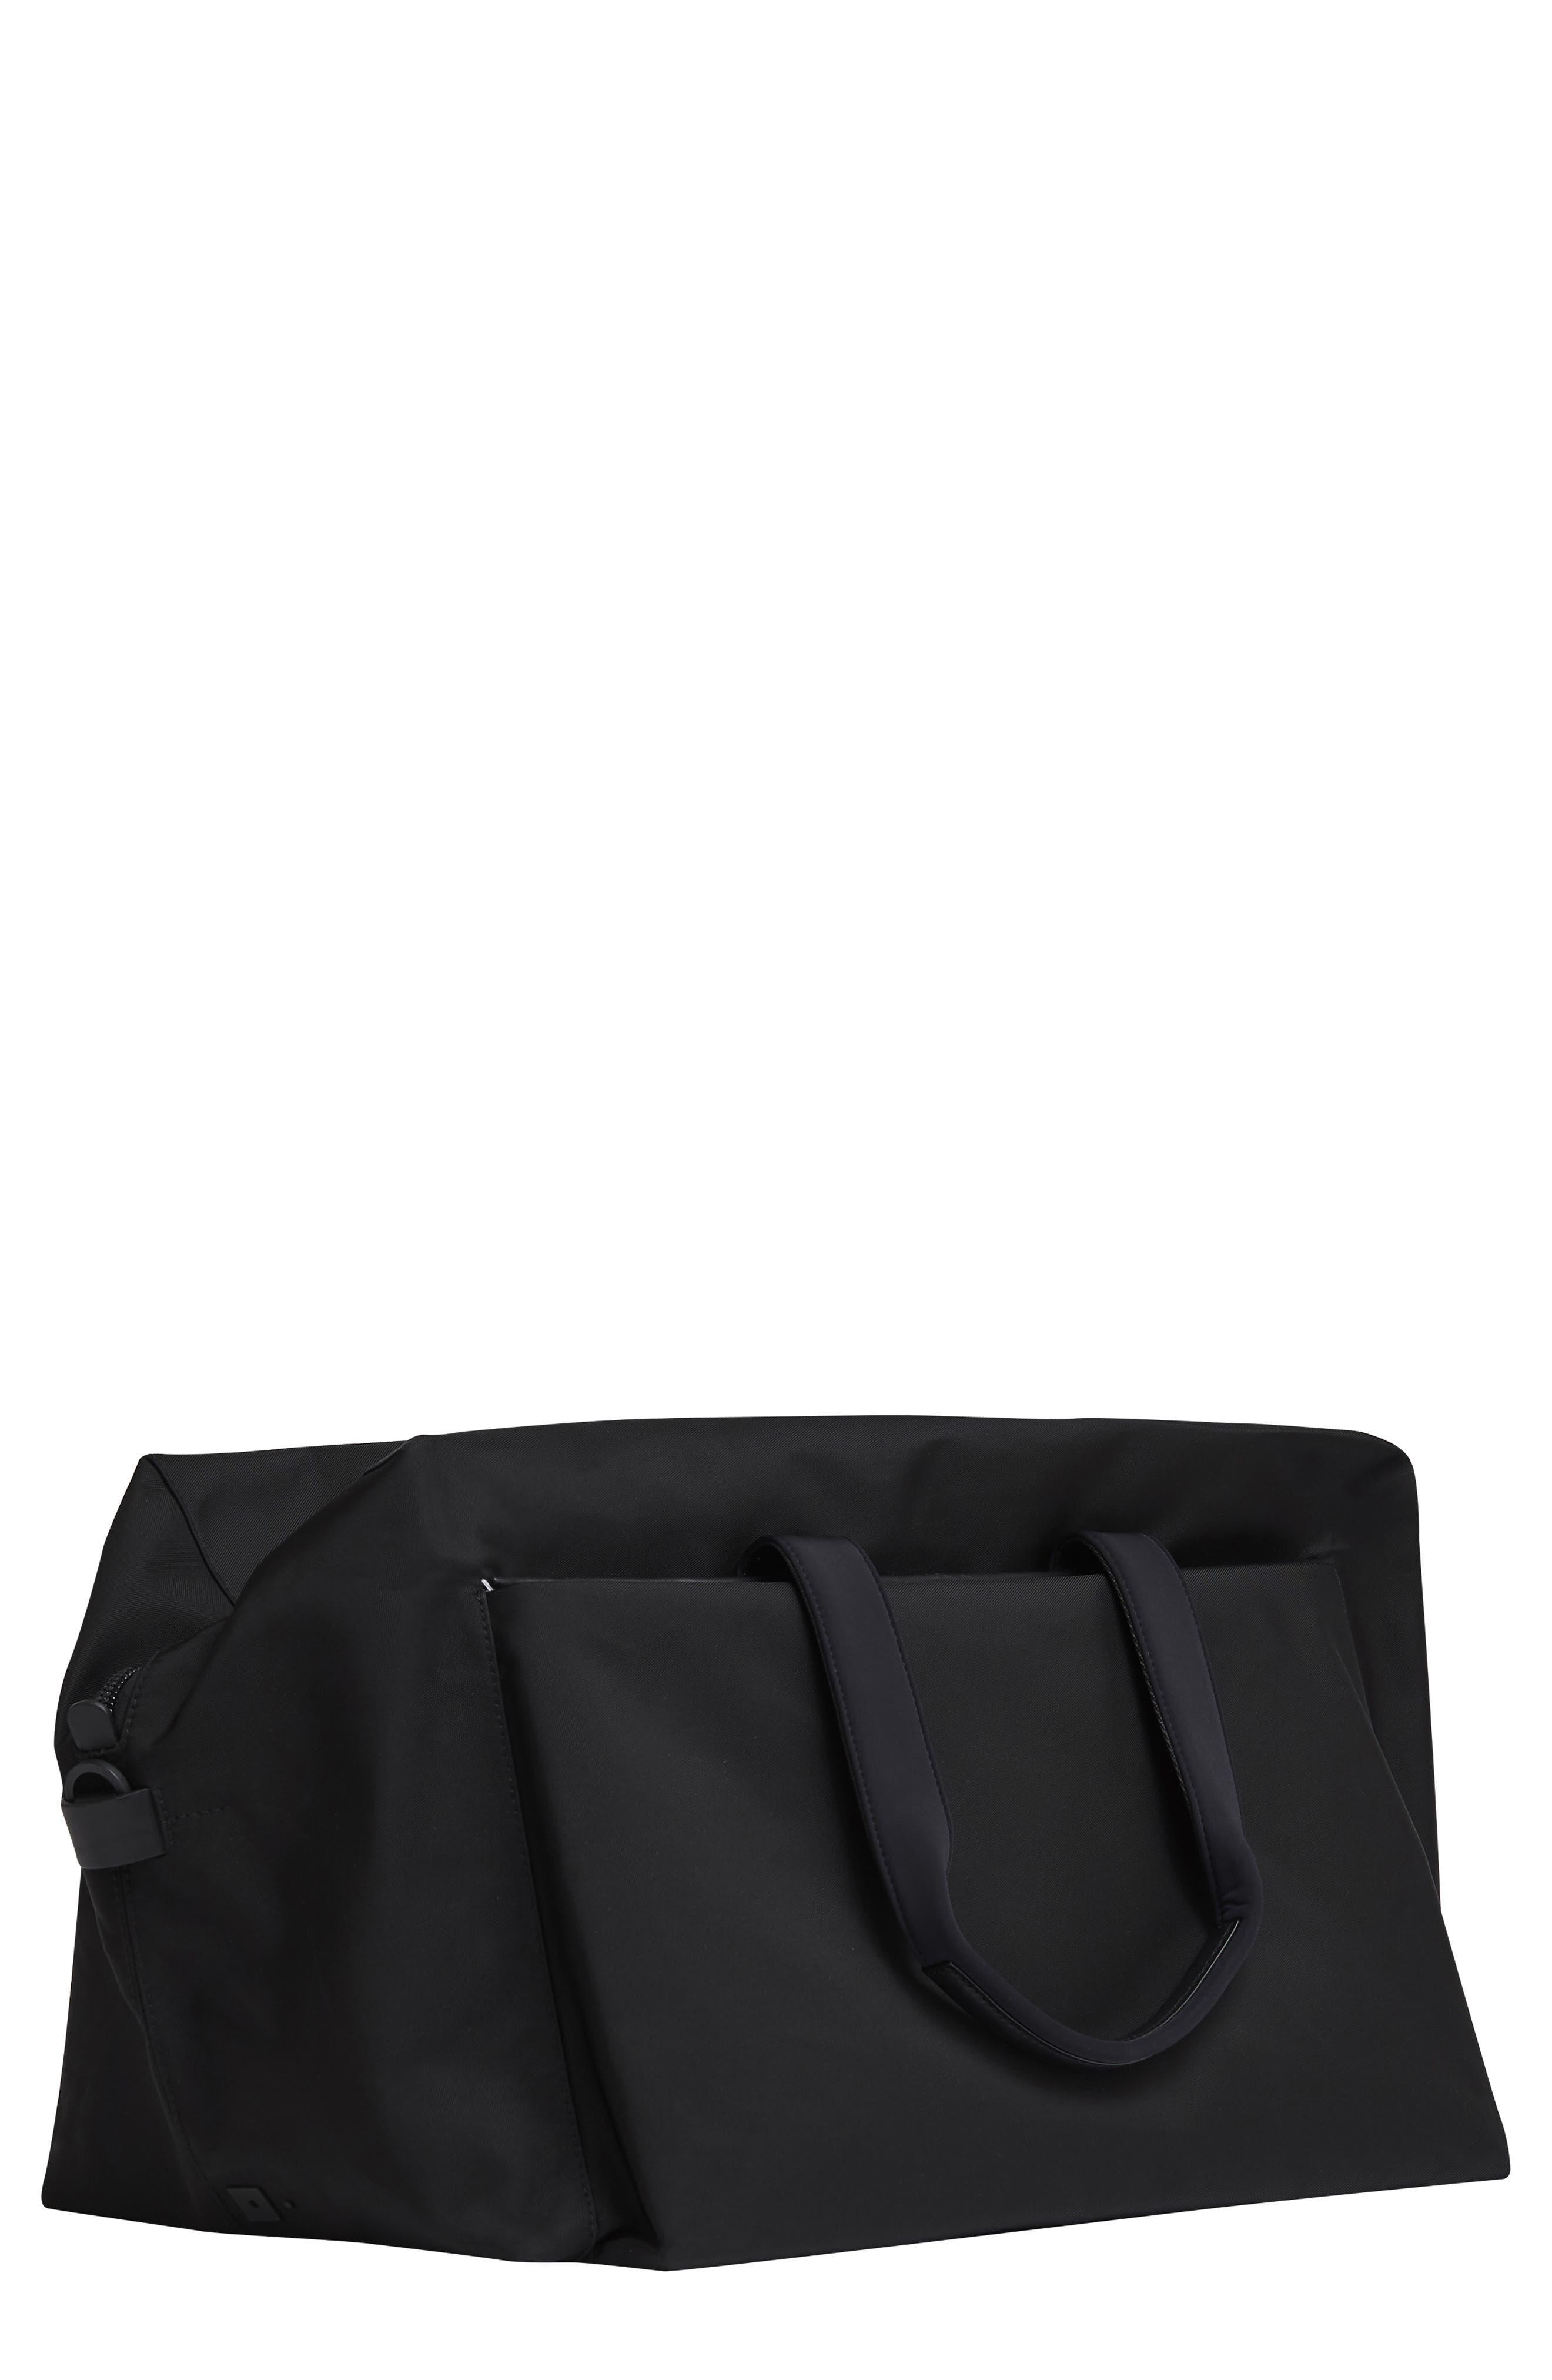 Lightweight Duffel Bag,                             Main thumbnail 1, color,                             Black Nylon/ Black Leather